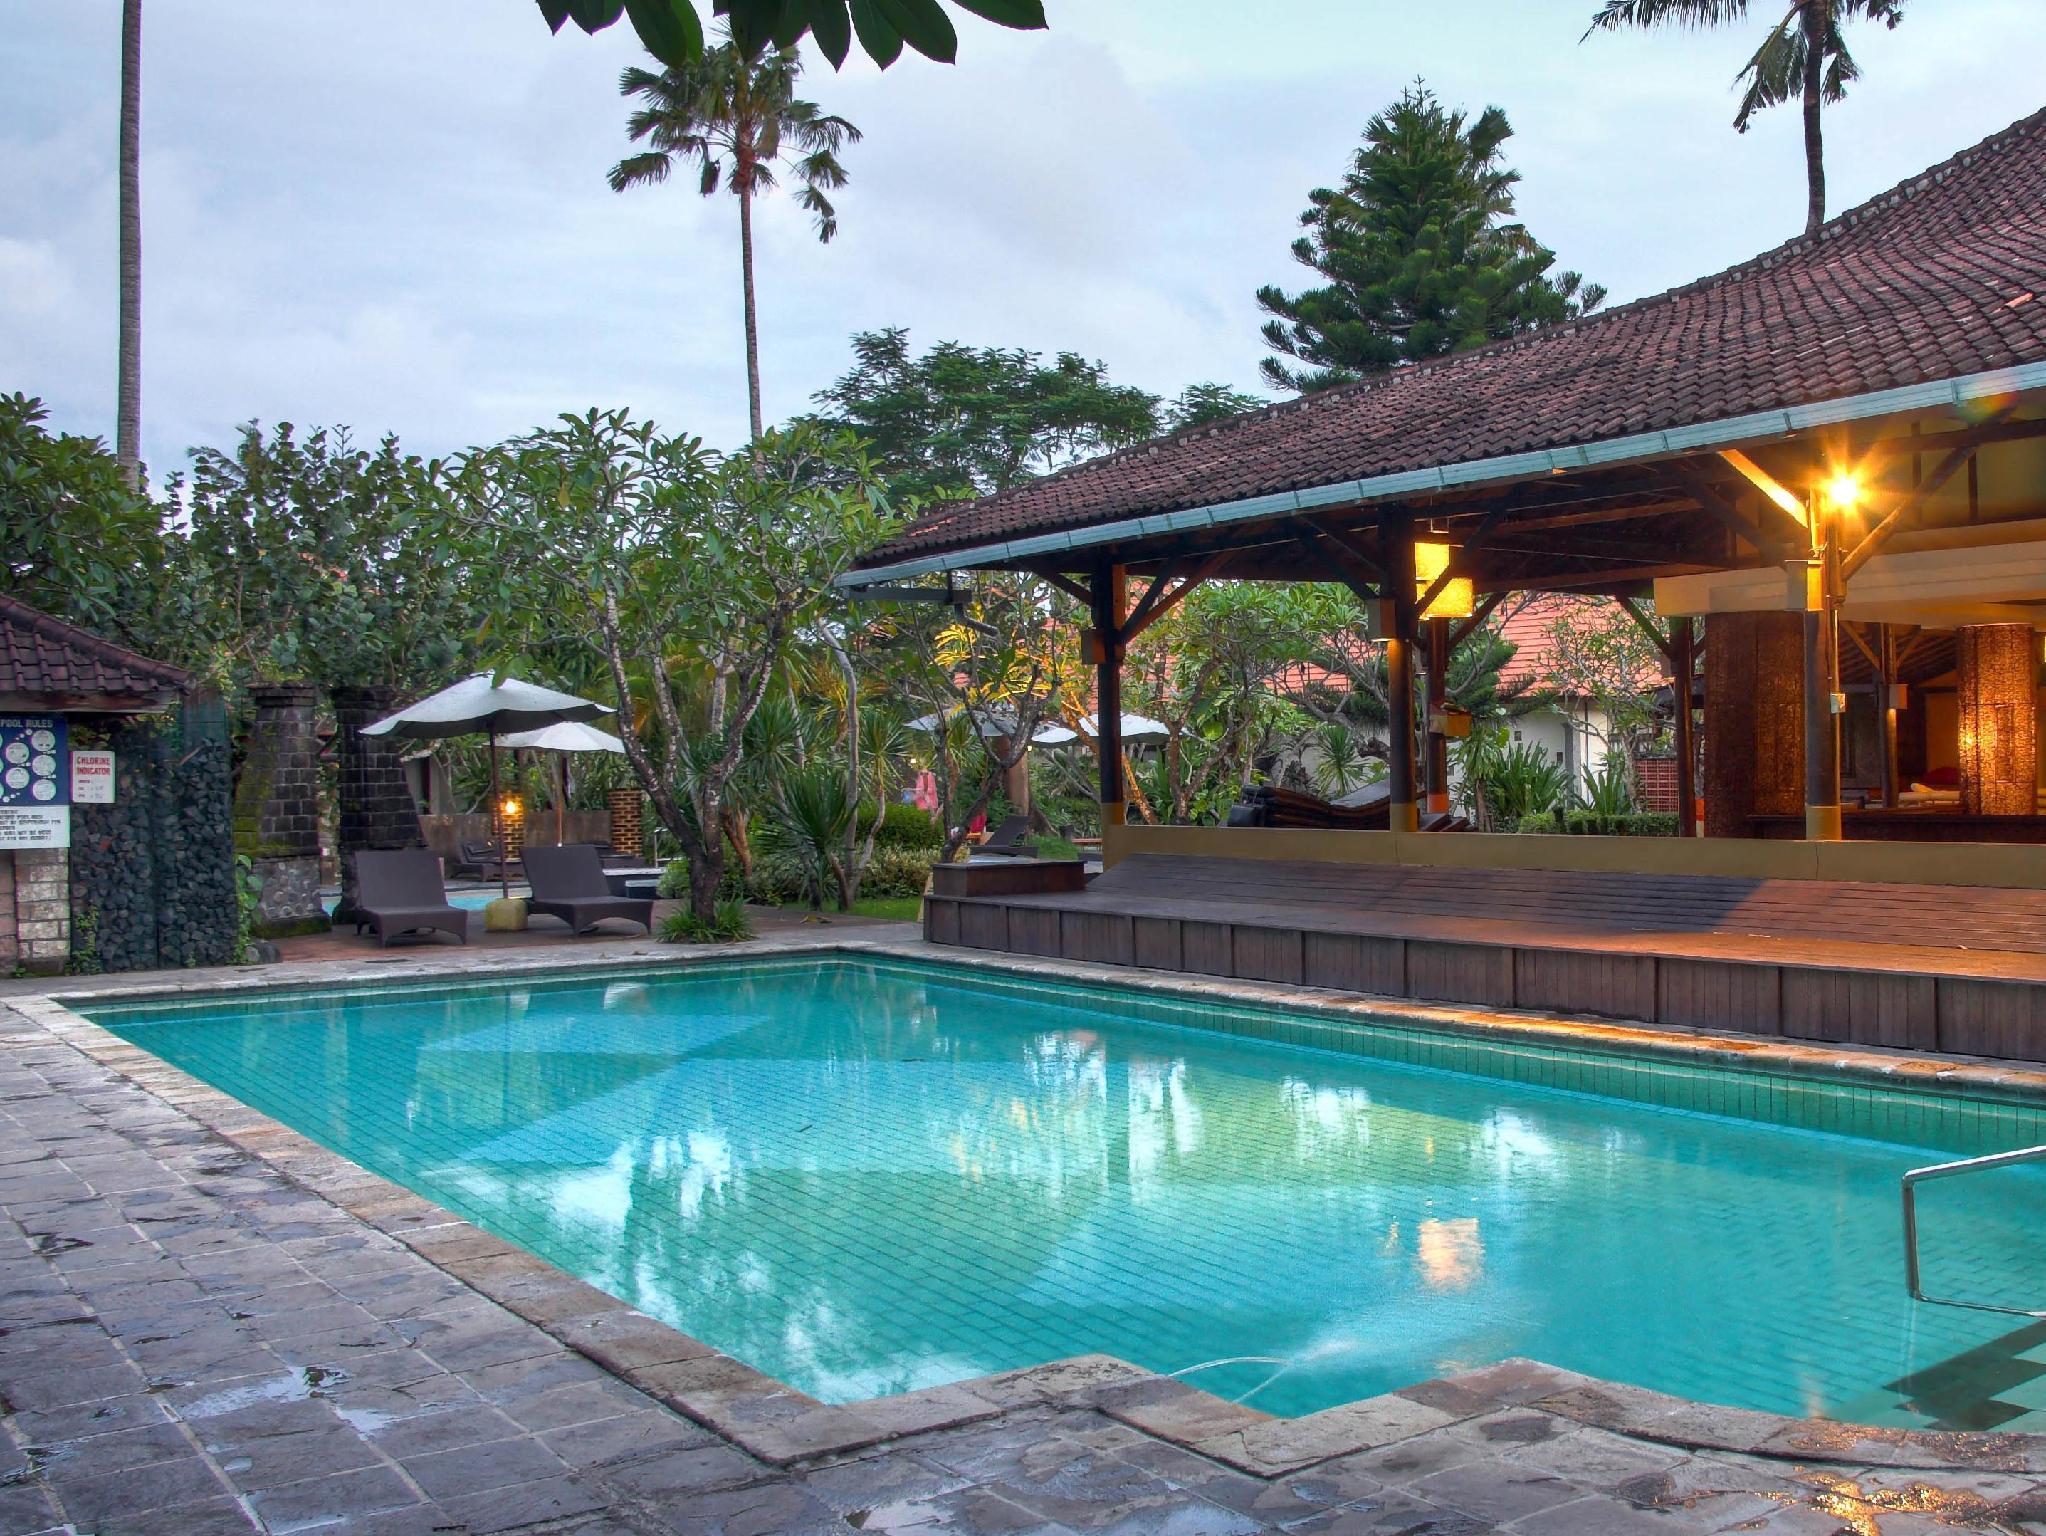 Peneeda View Beach Hotel Sanur Bali Indonesia Great Discounted Rates